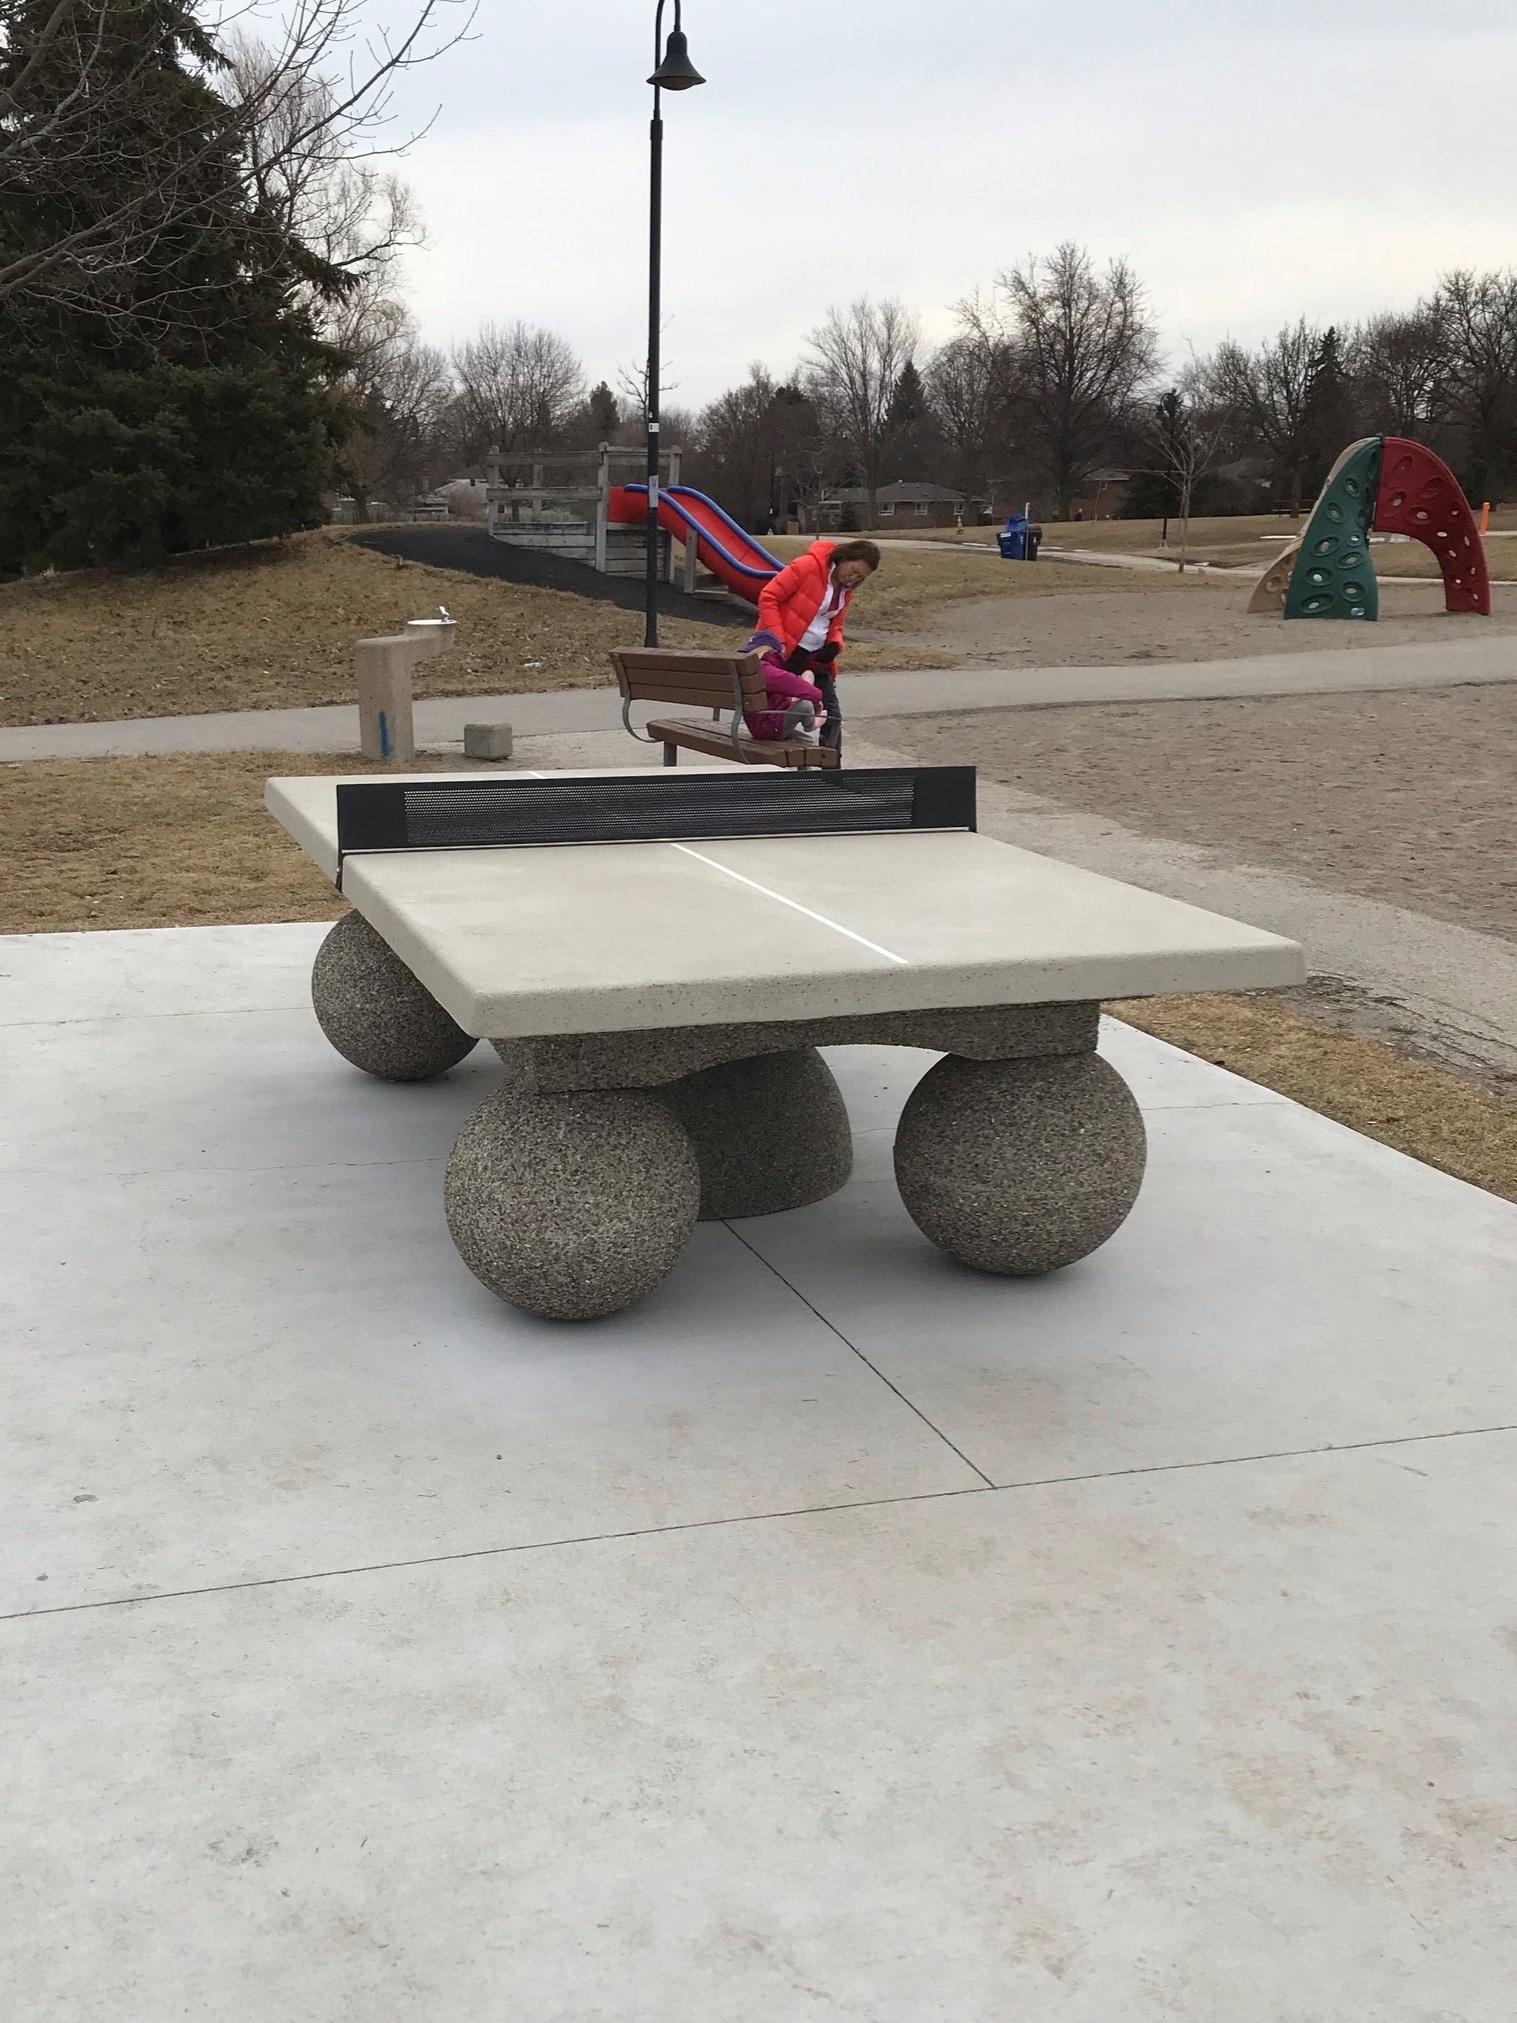 Ping Pong table in Bellbury Park